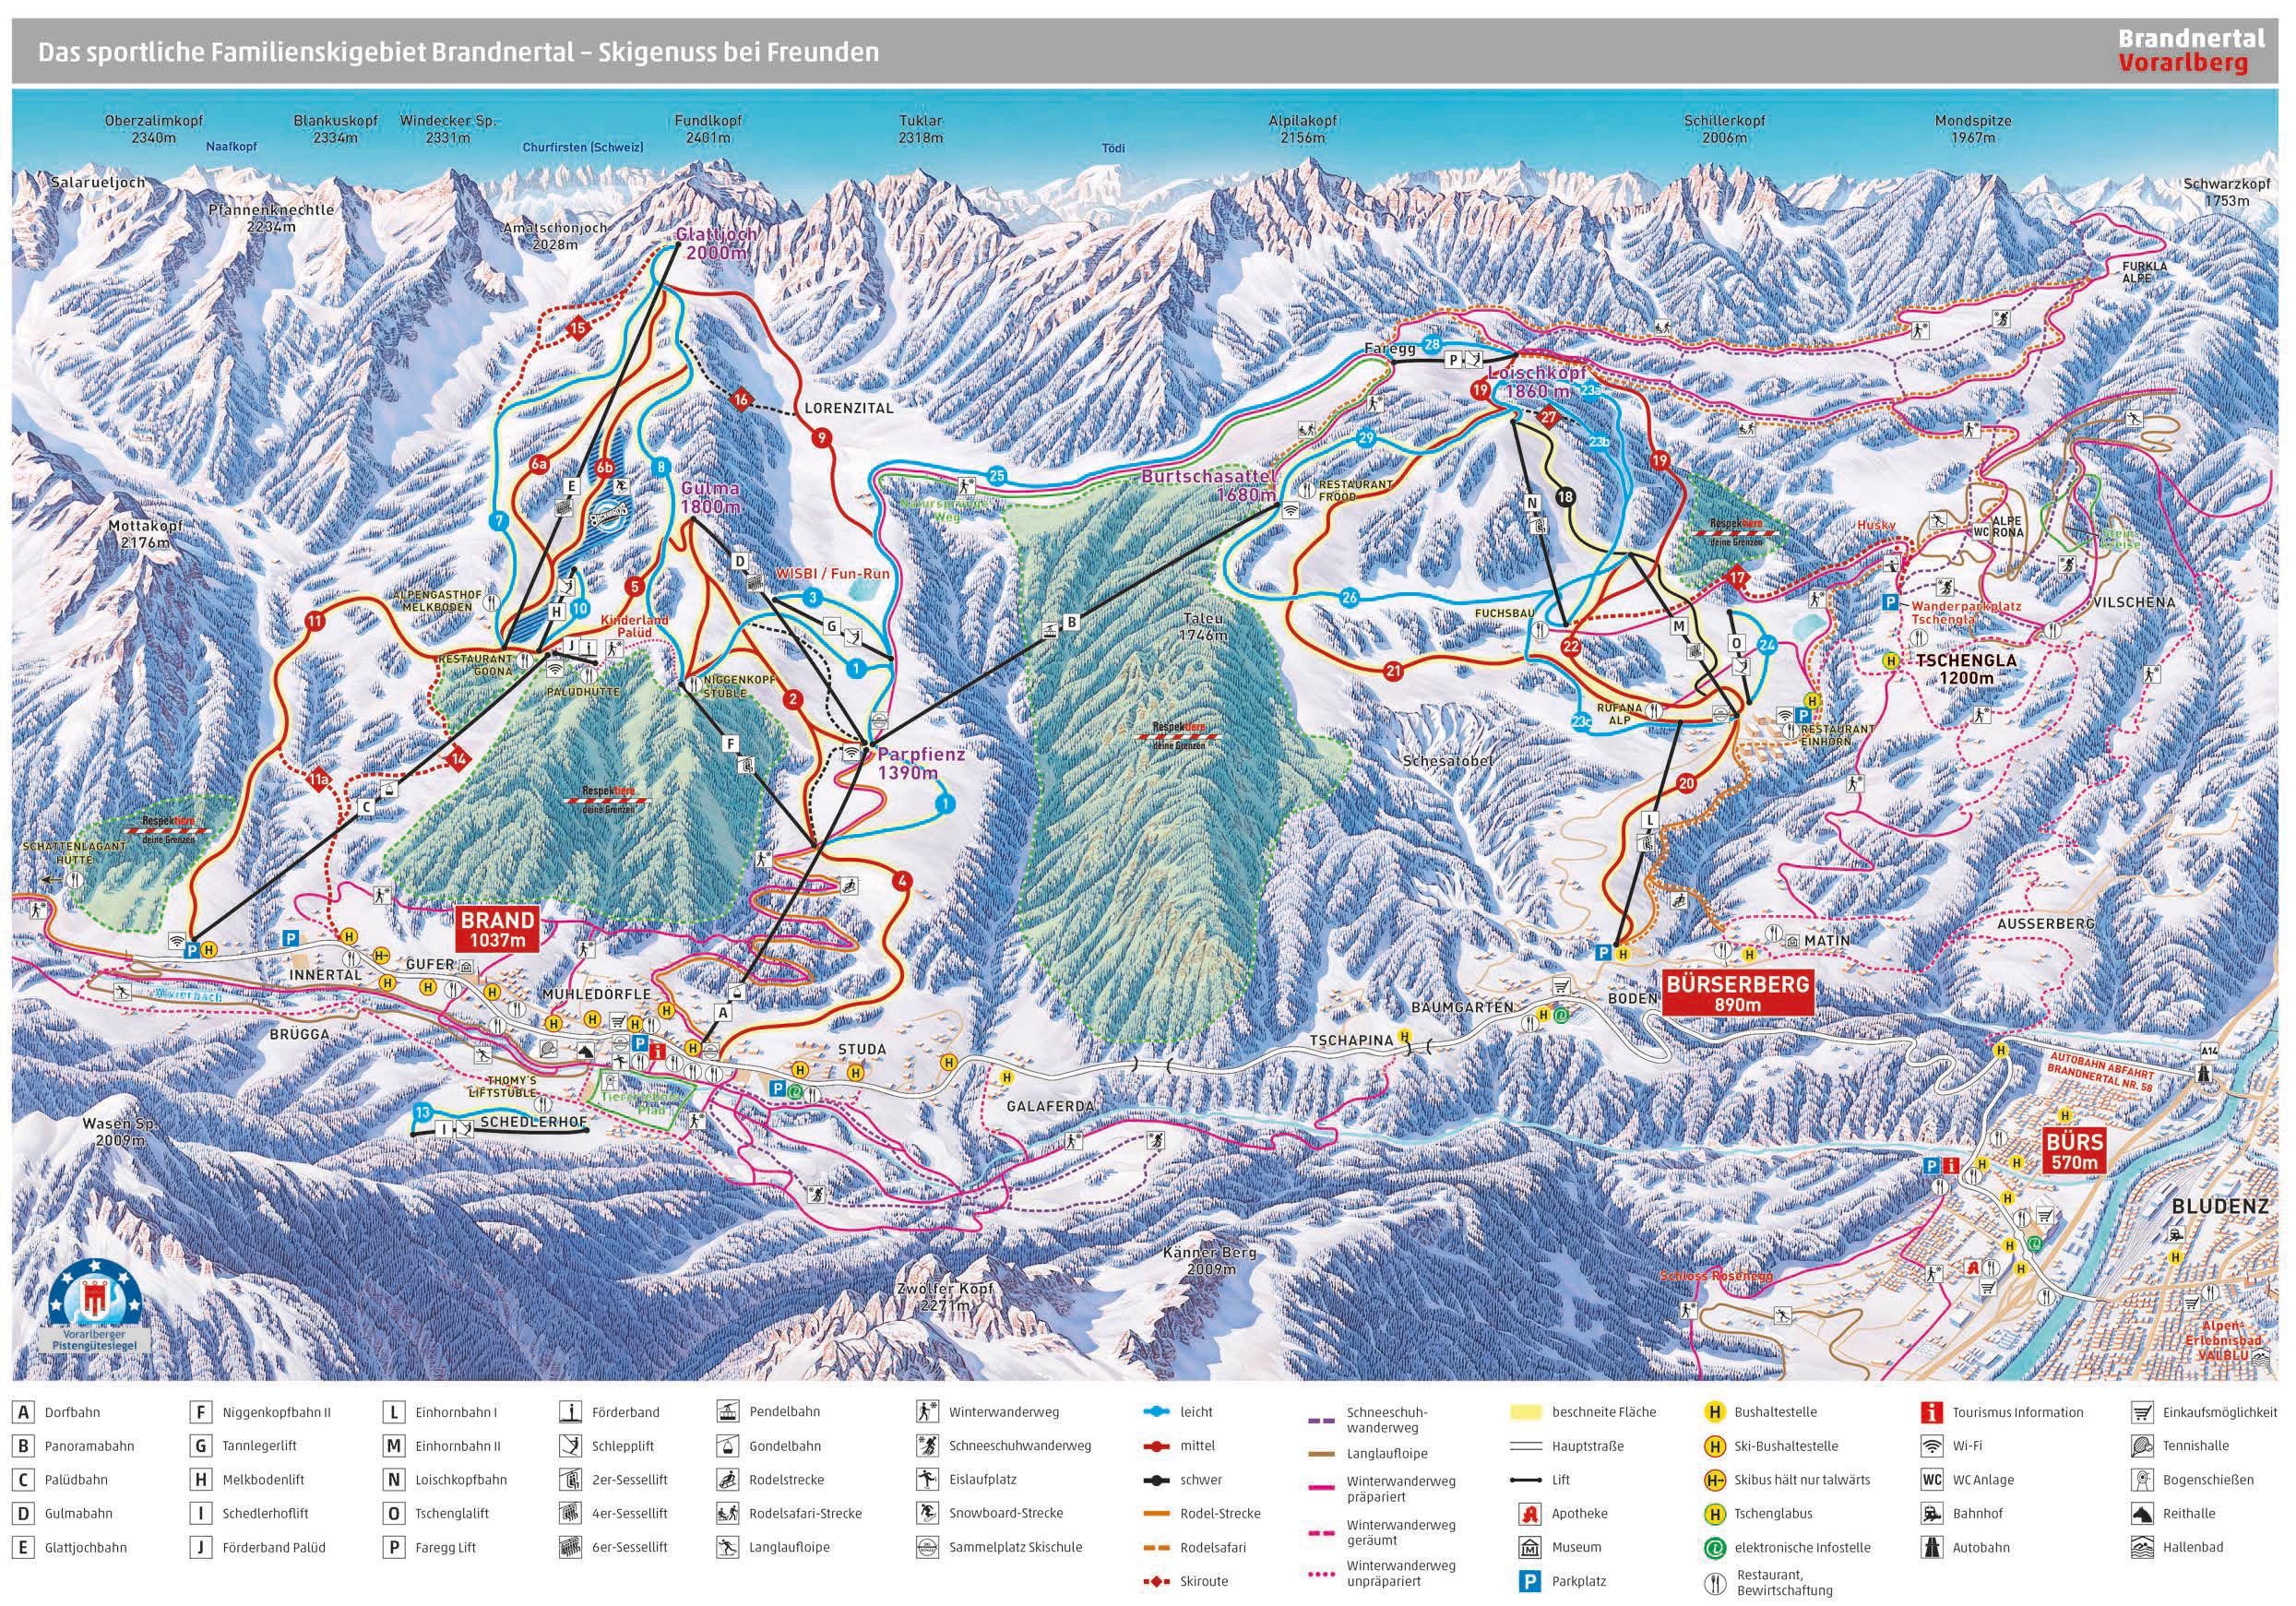 Brandnertal (Brand und Bürserberg) Piste / Trail Map